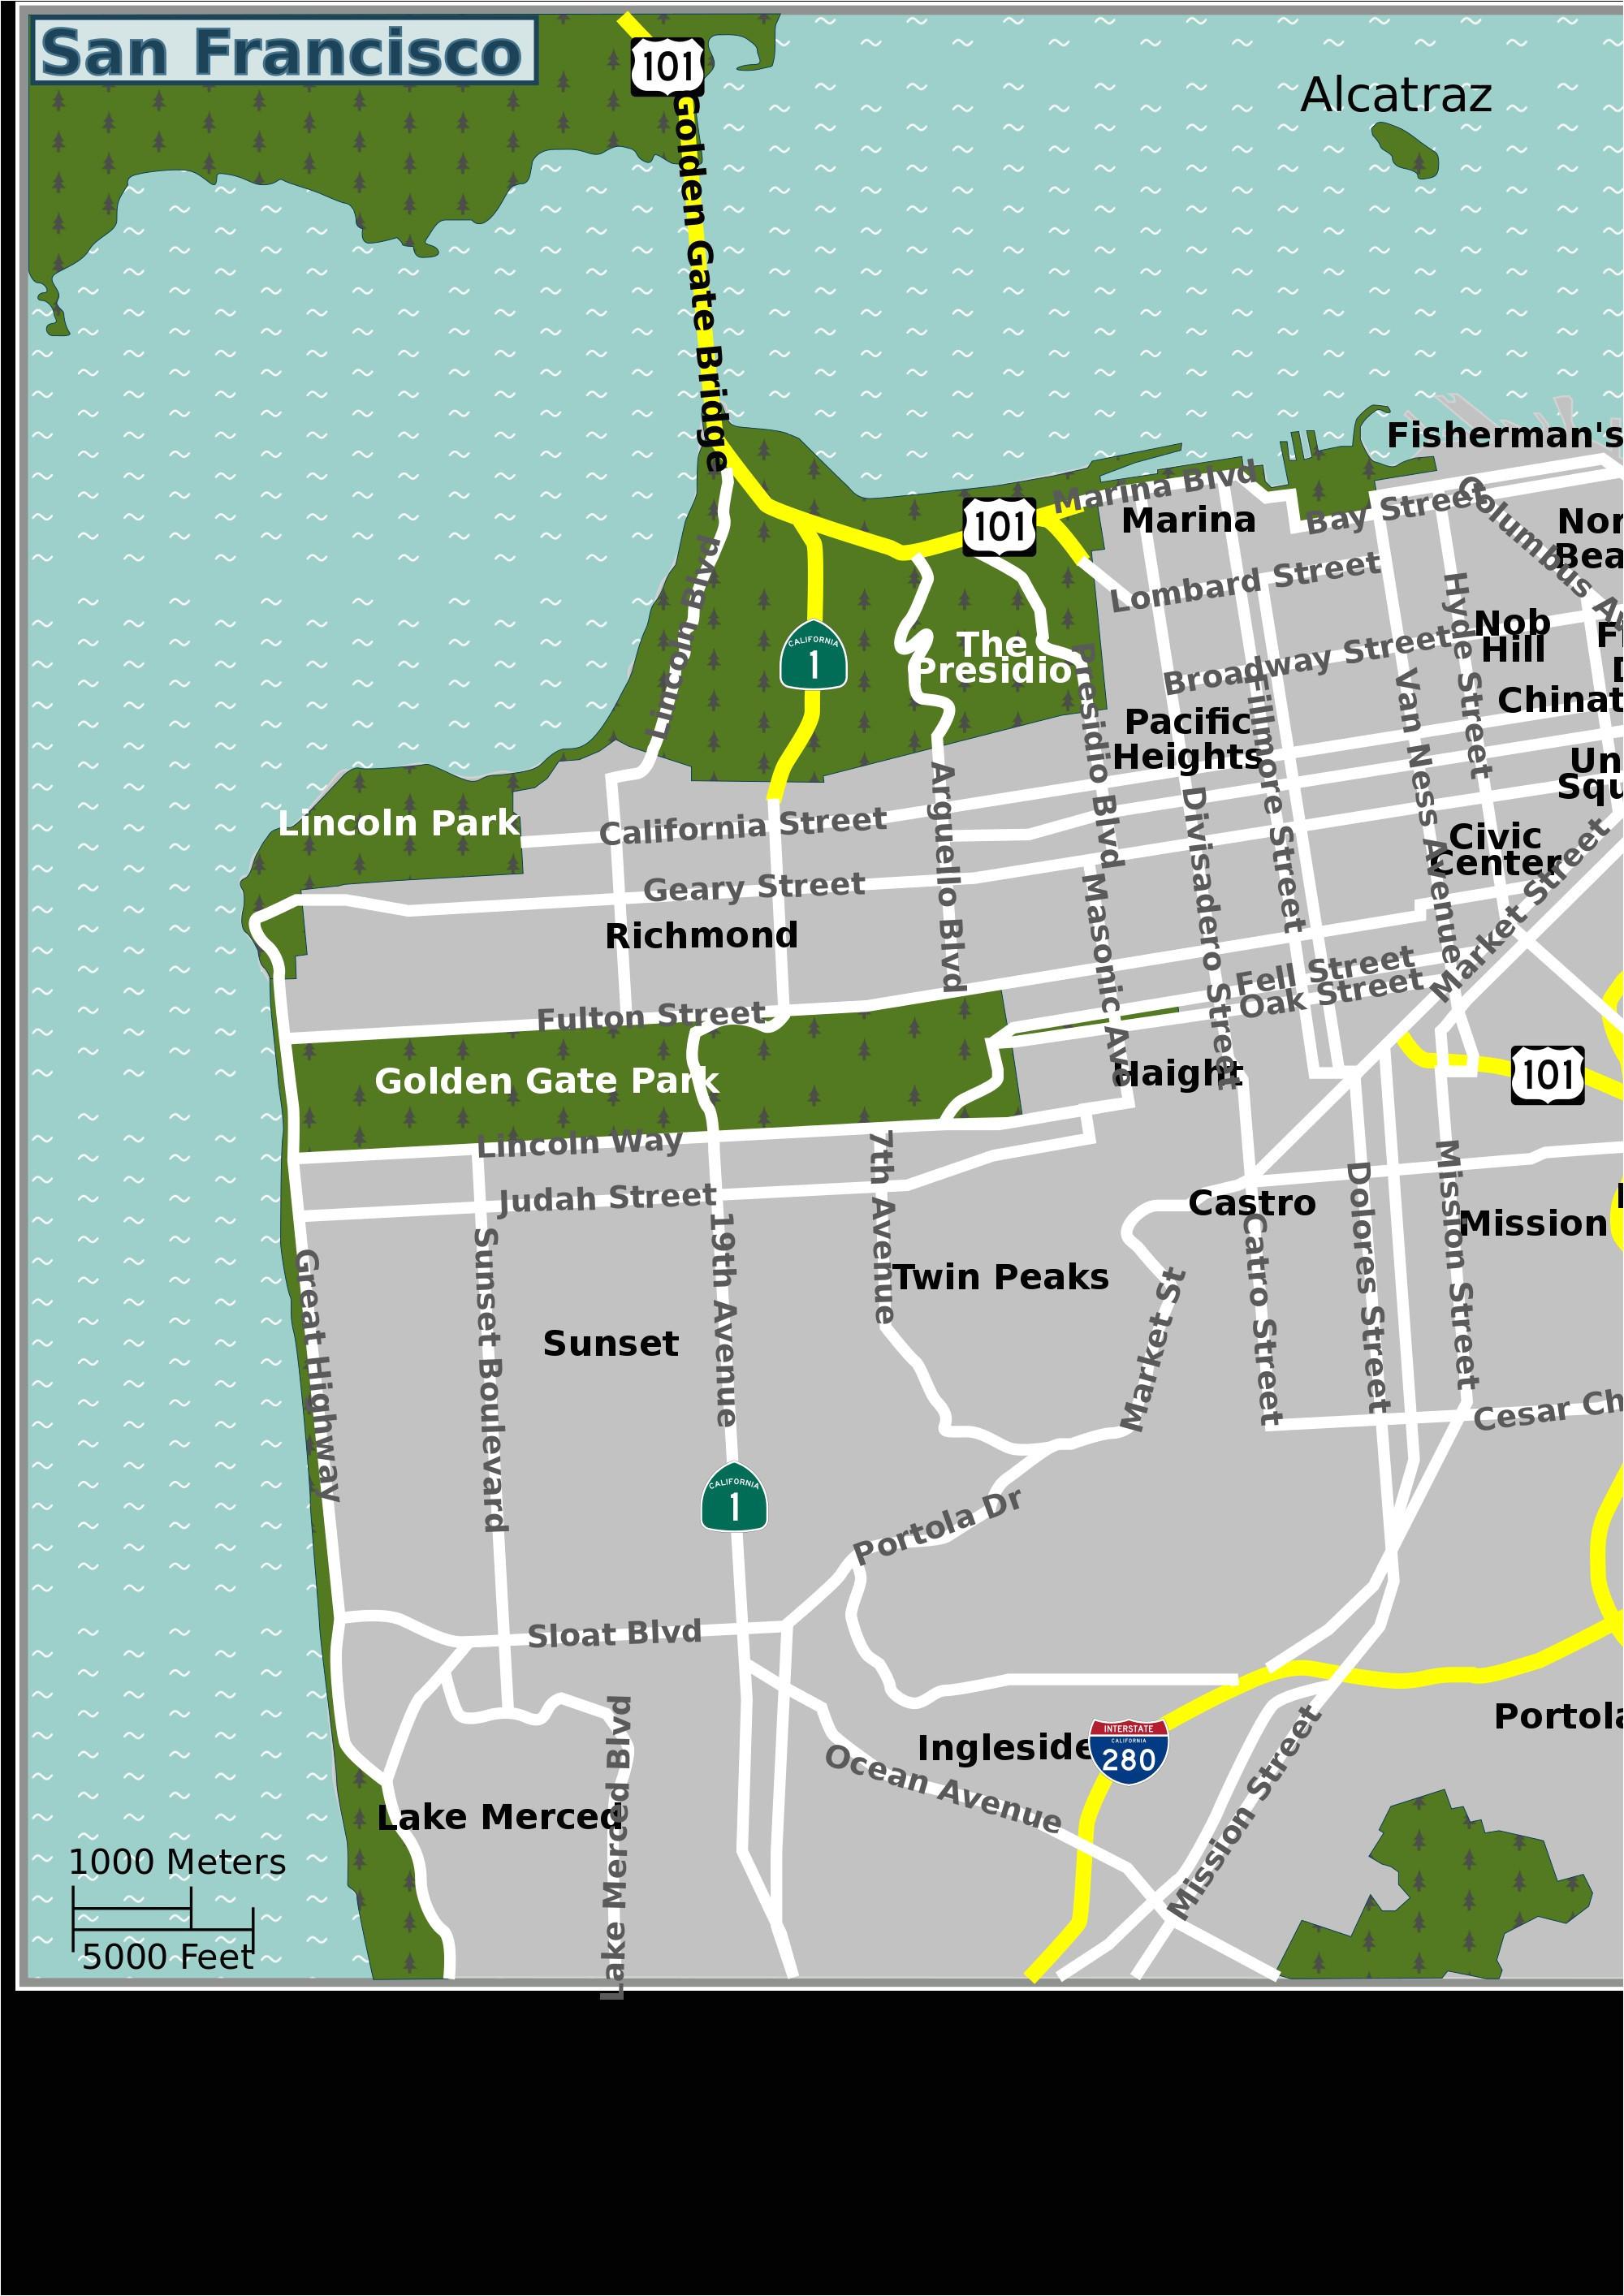 google maps salt lake city new google maps sacramento area valid usa map california highlighted